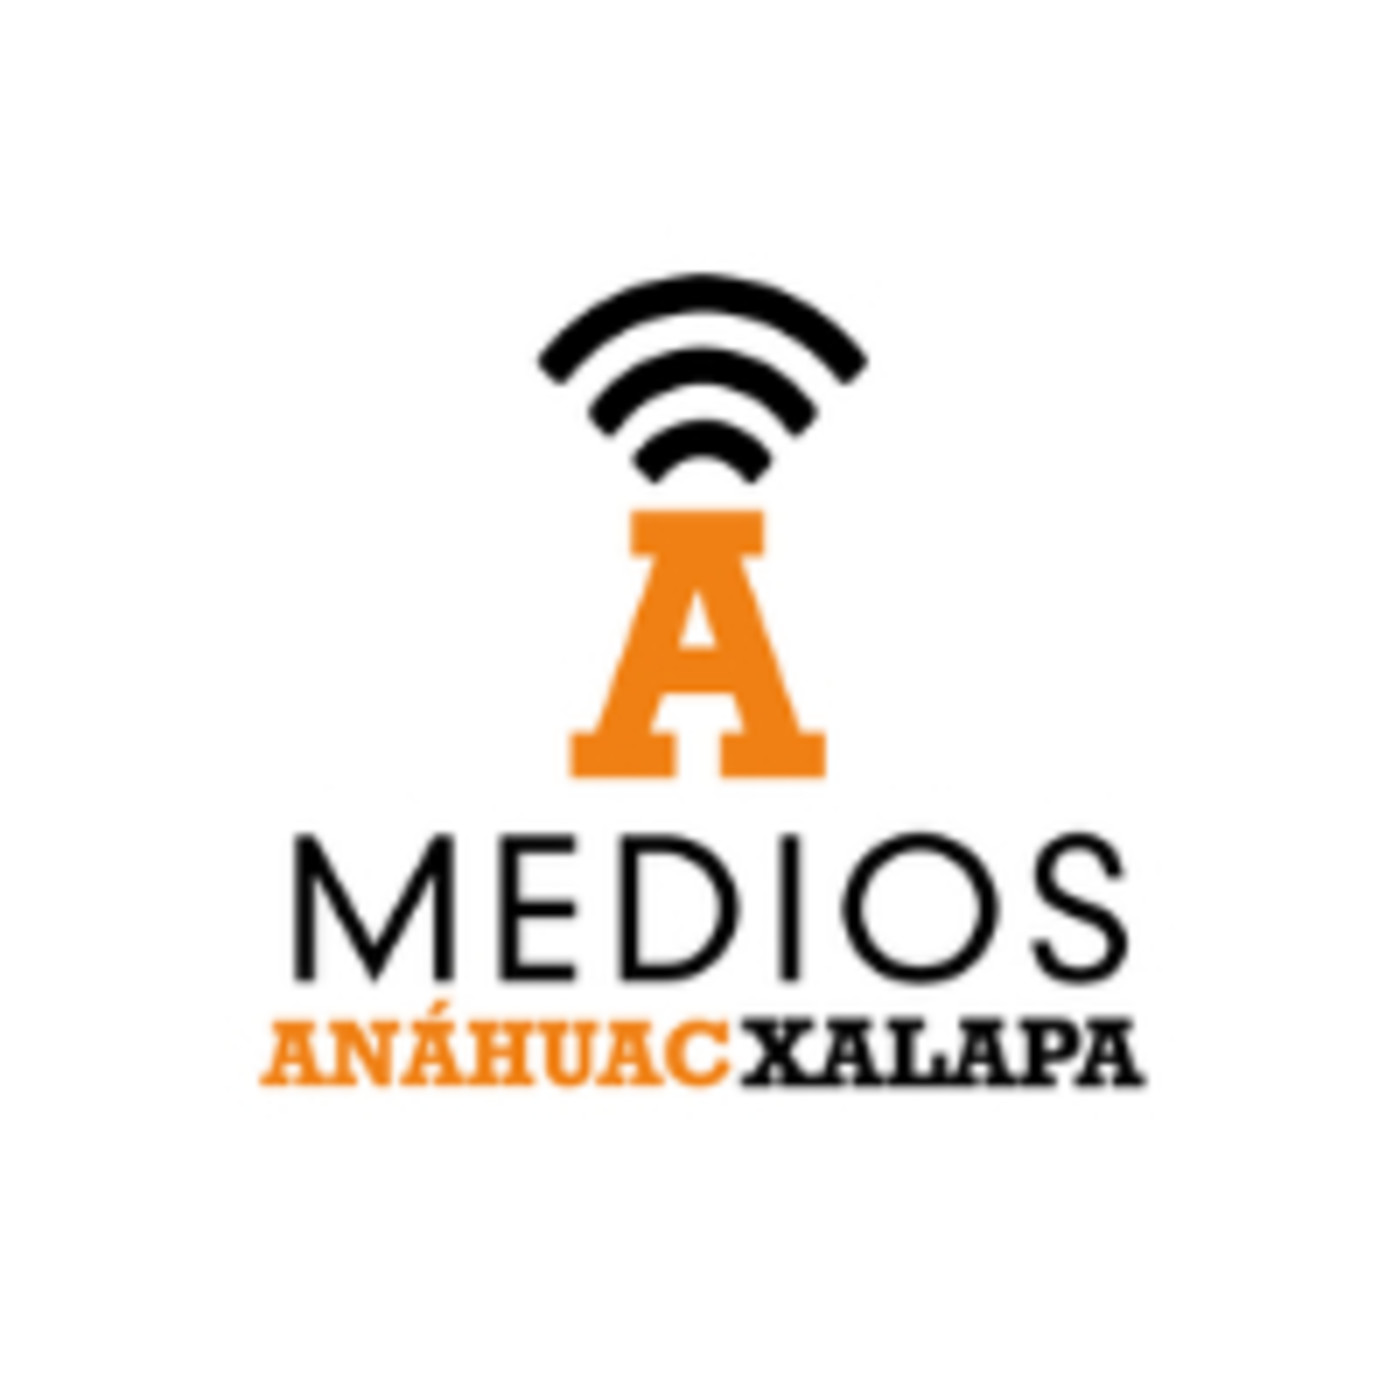 Medios Anahuac Xalapa